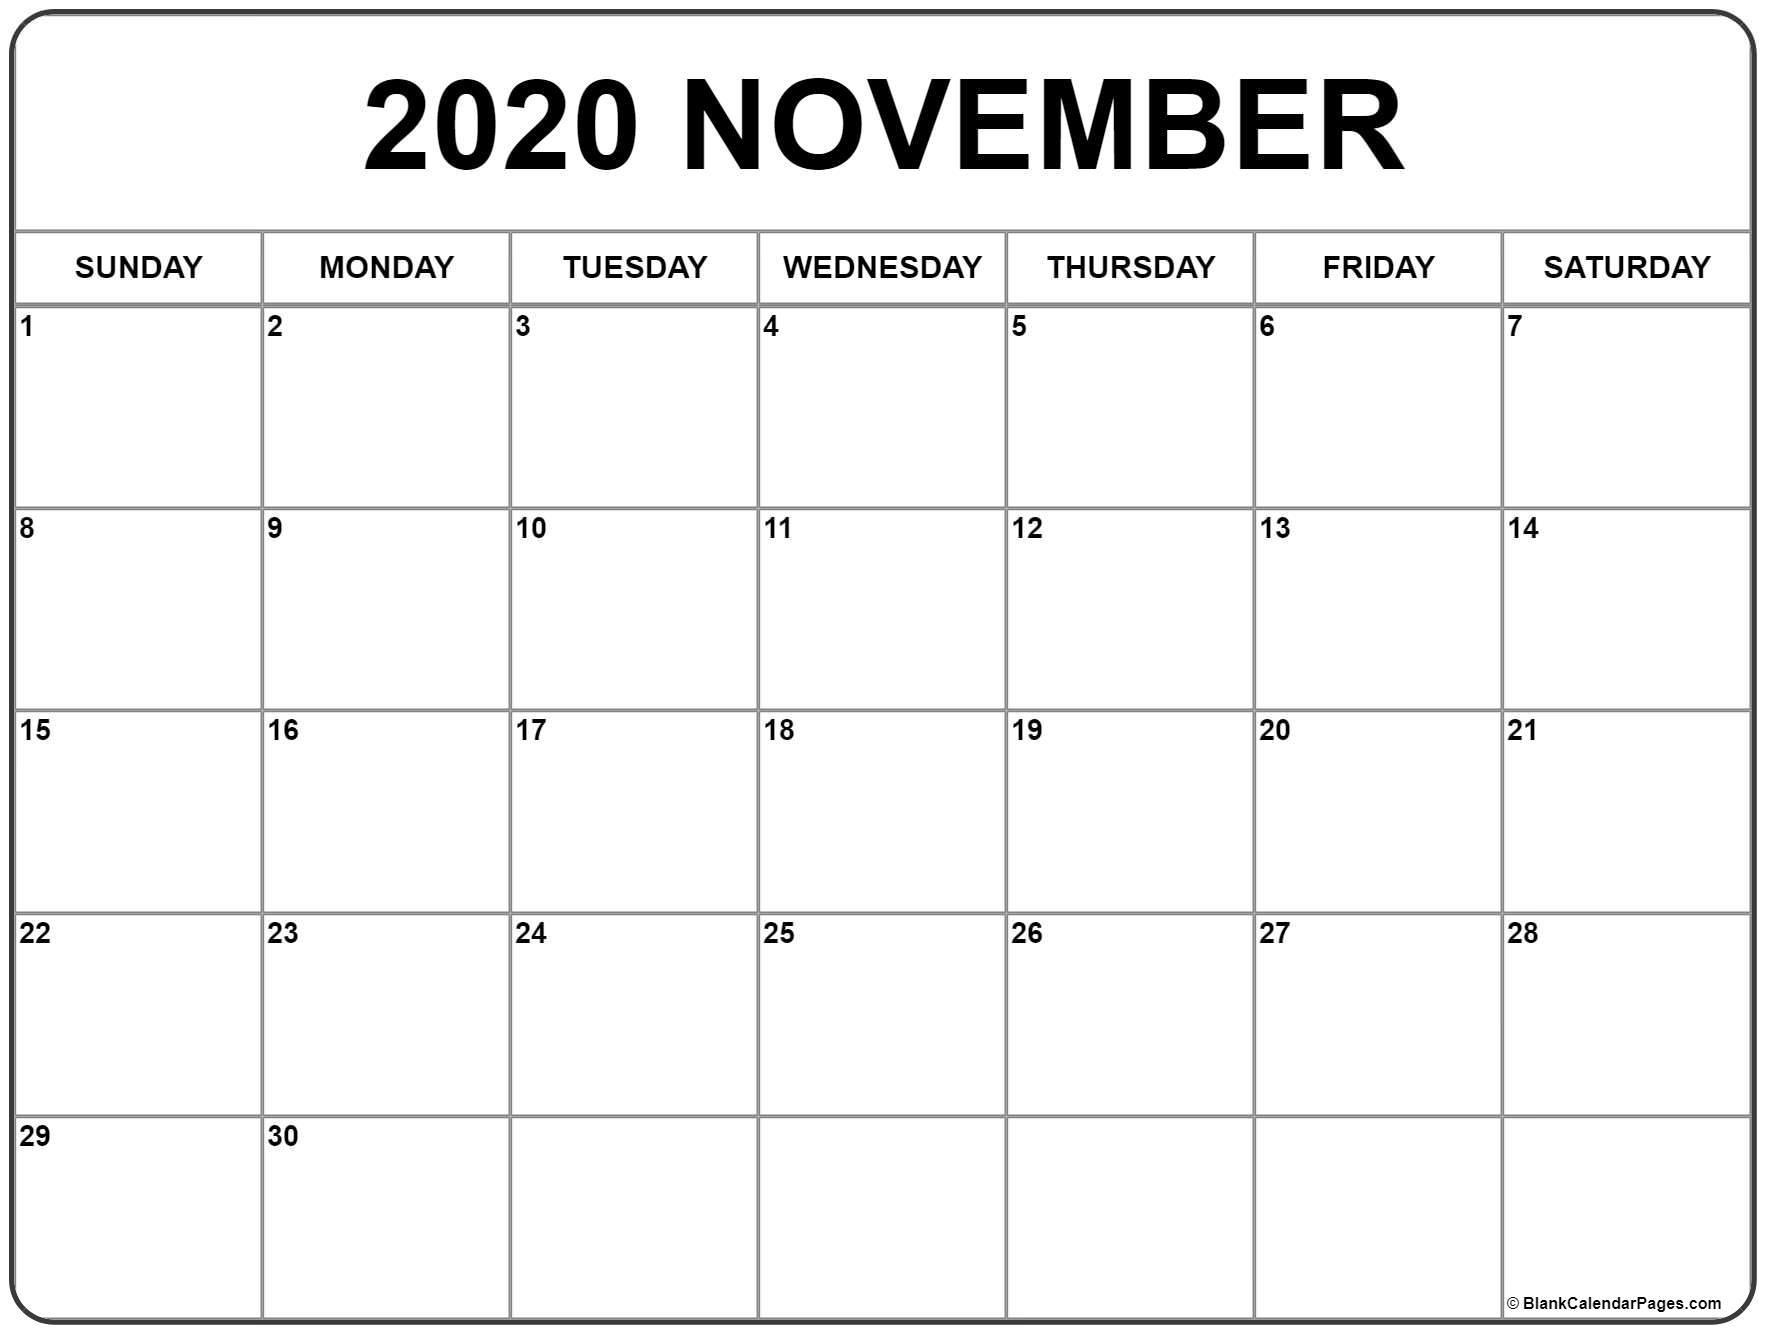 November 2020 Calendar   Free Printable Monthly Calendars